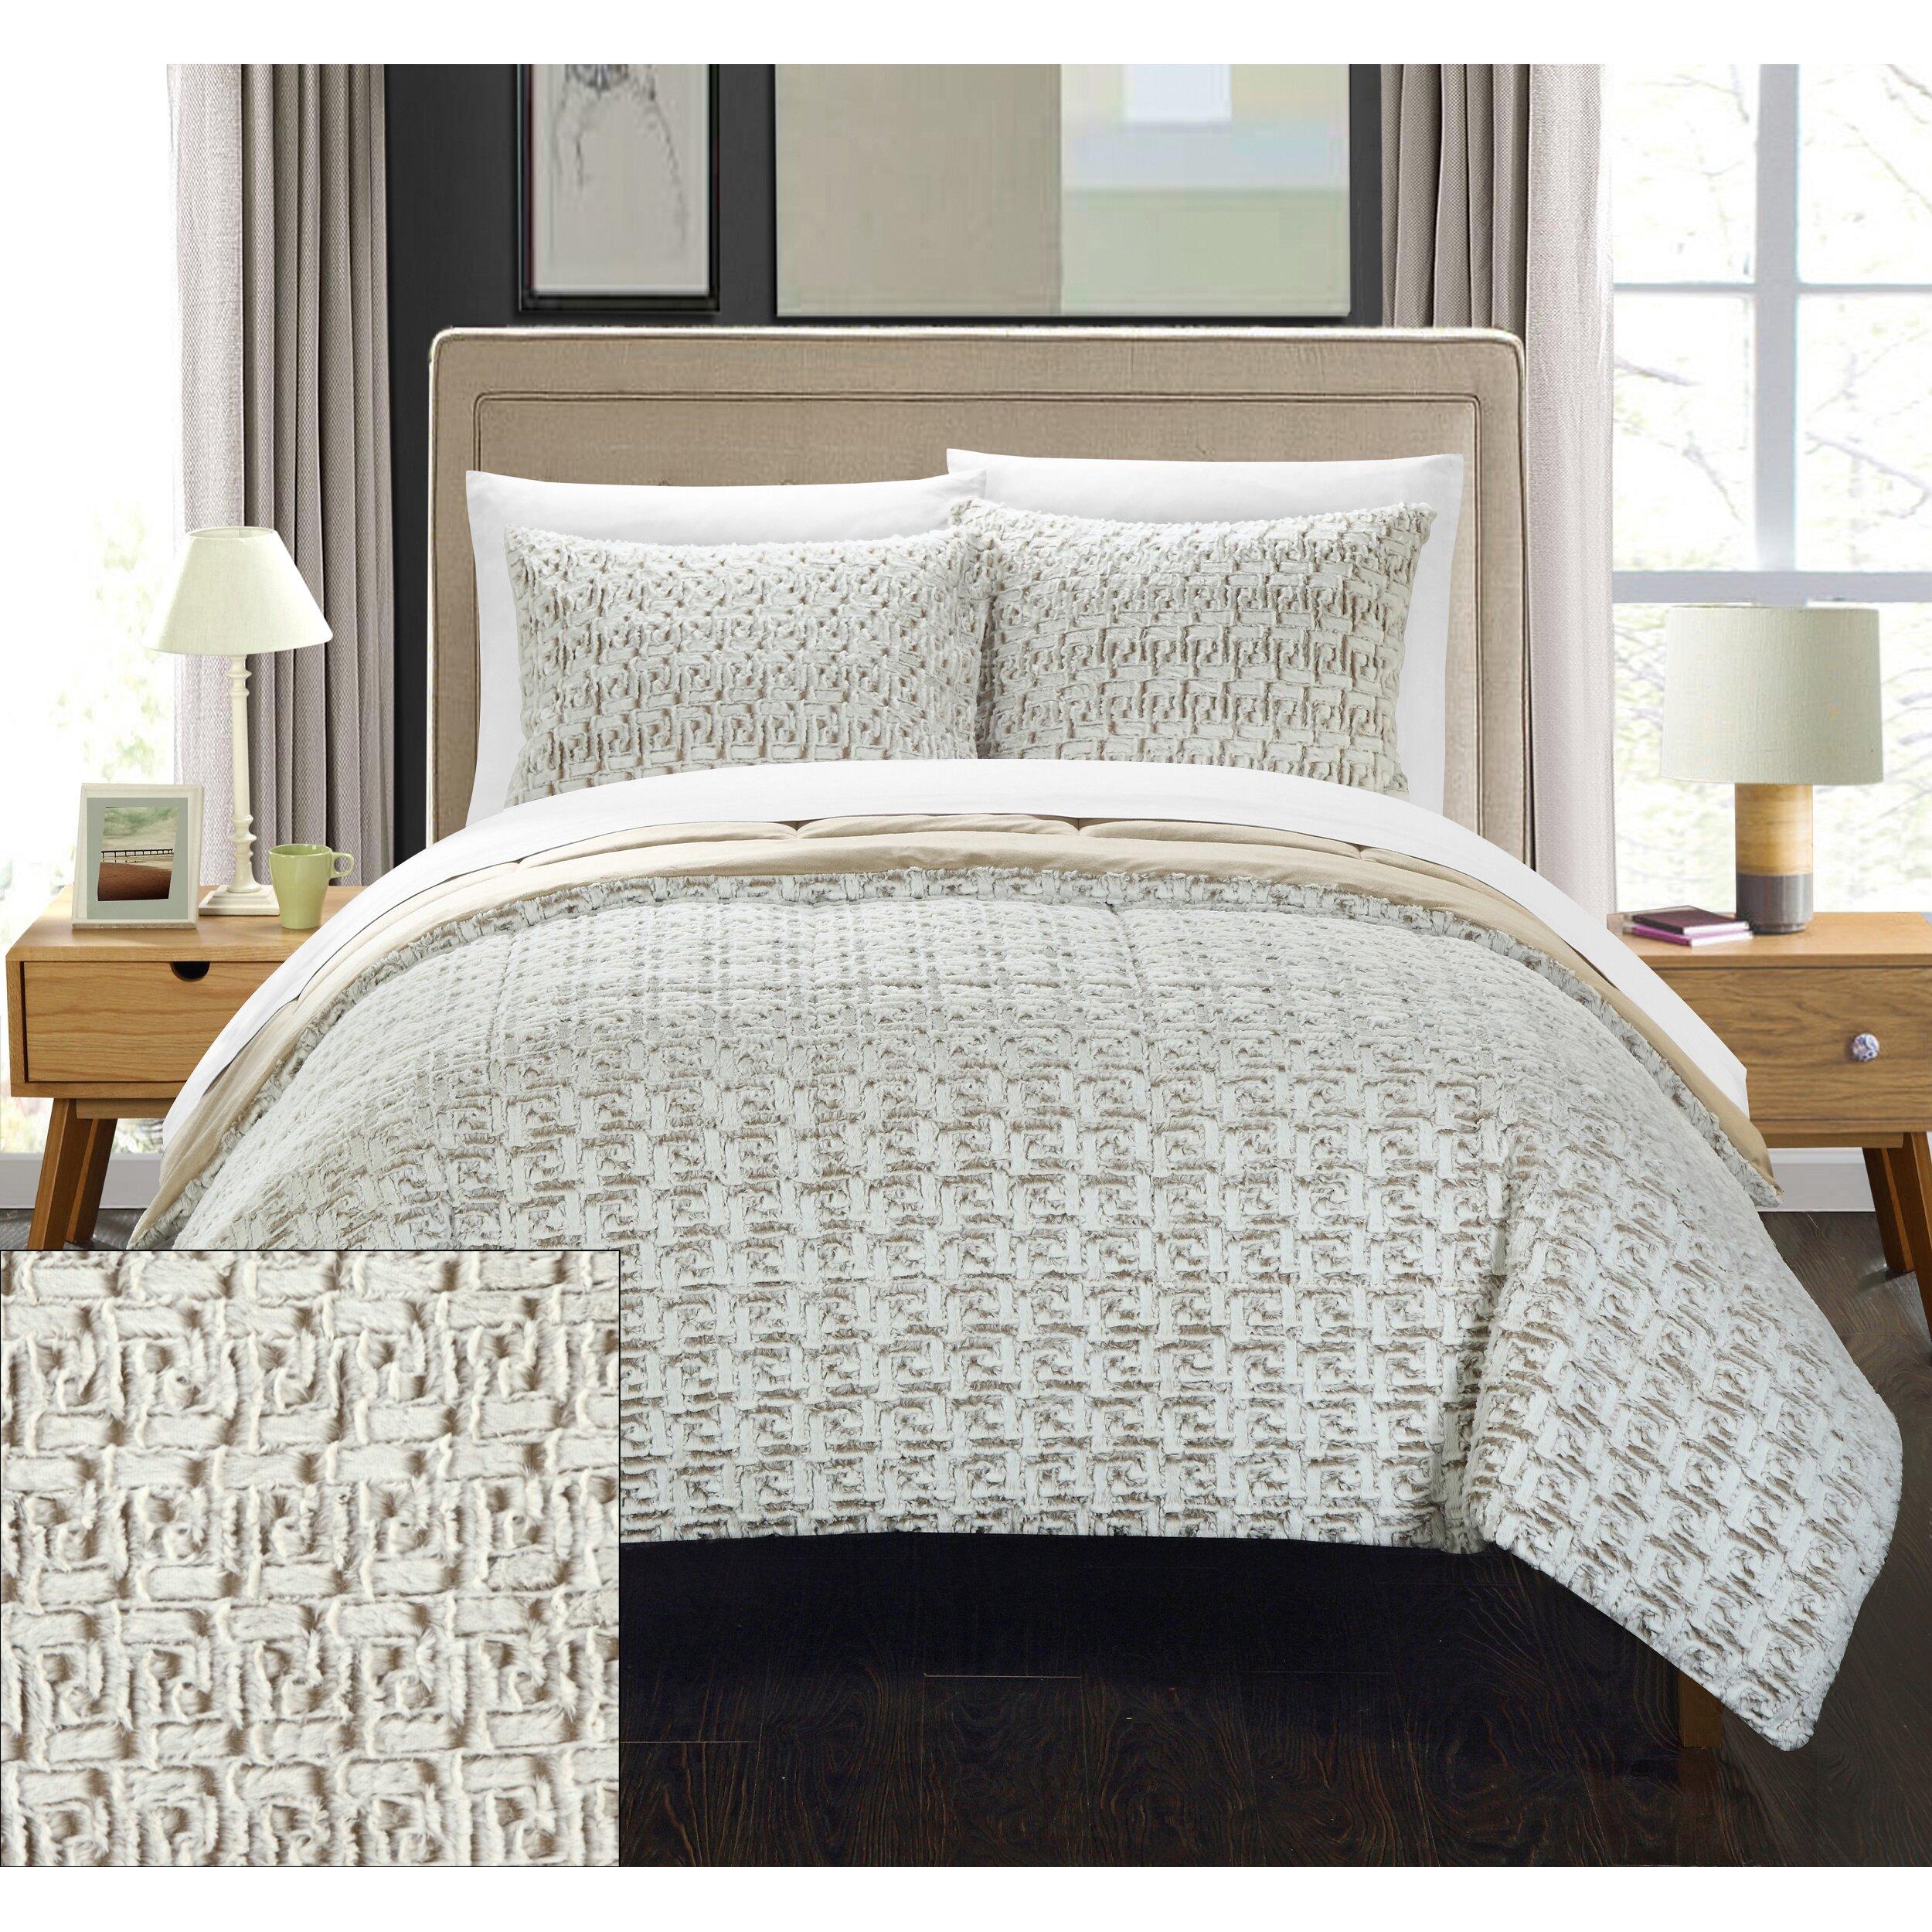 chic home greece 7 piece queen comforter set wayfair. Black Bedroom Furniture Sets. Home Design Ideas